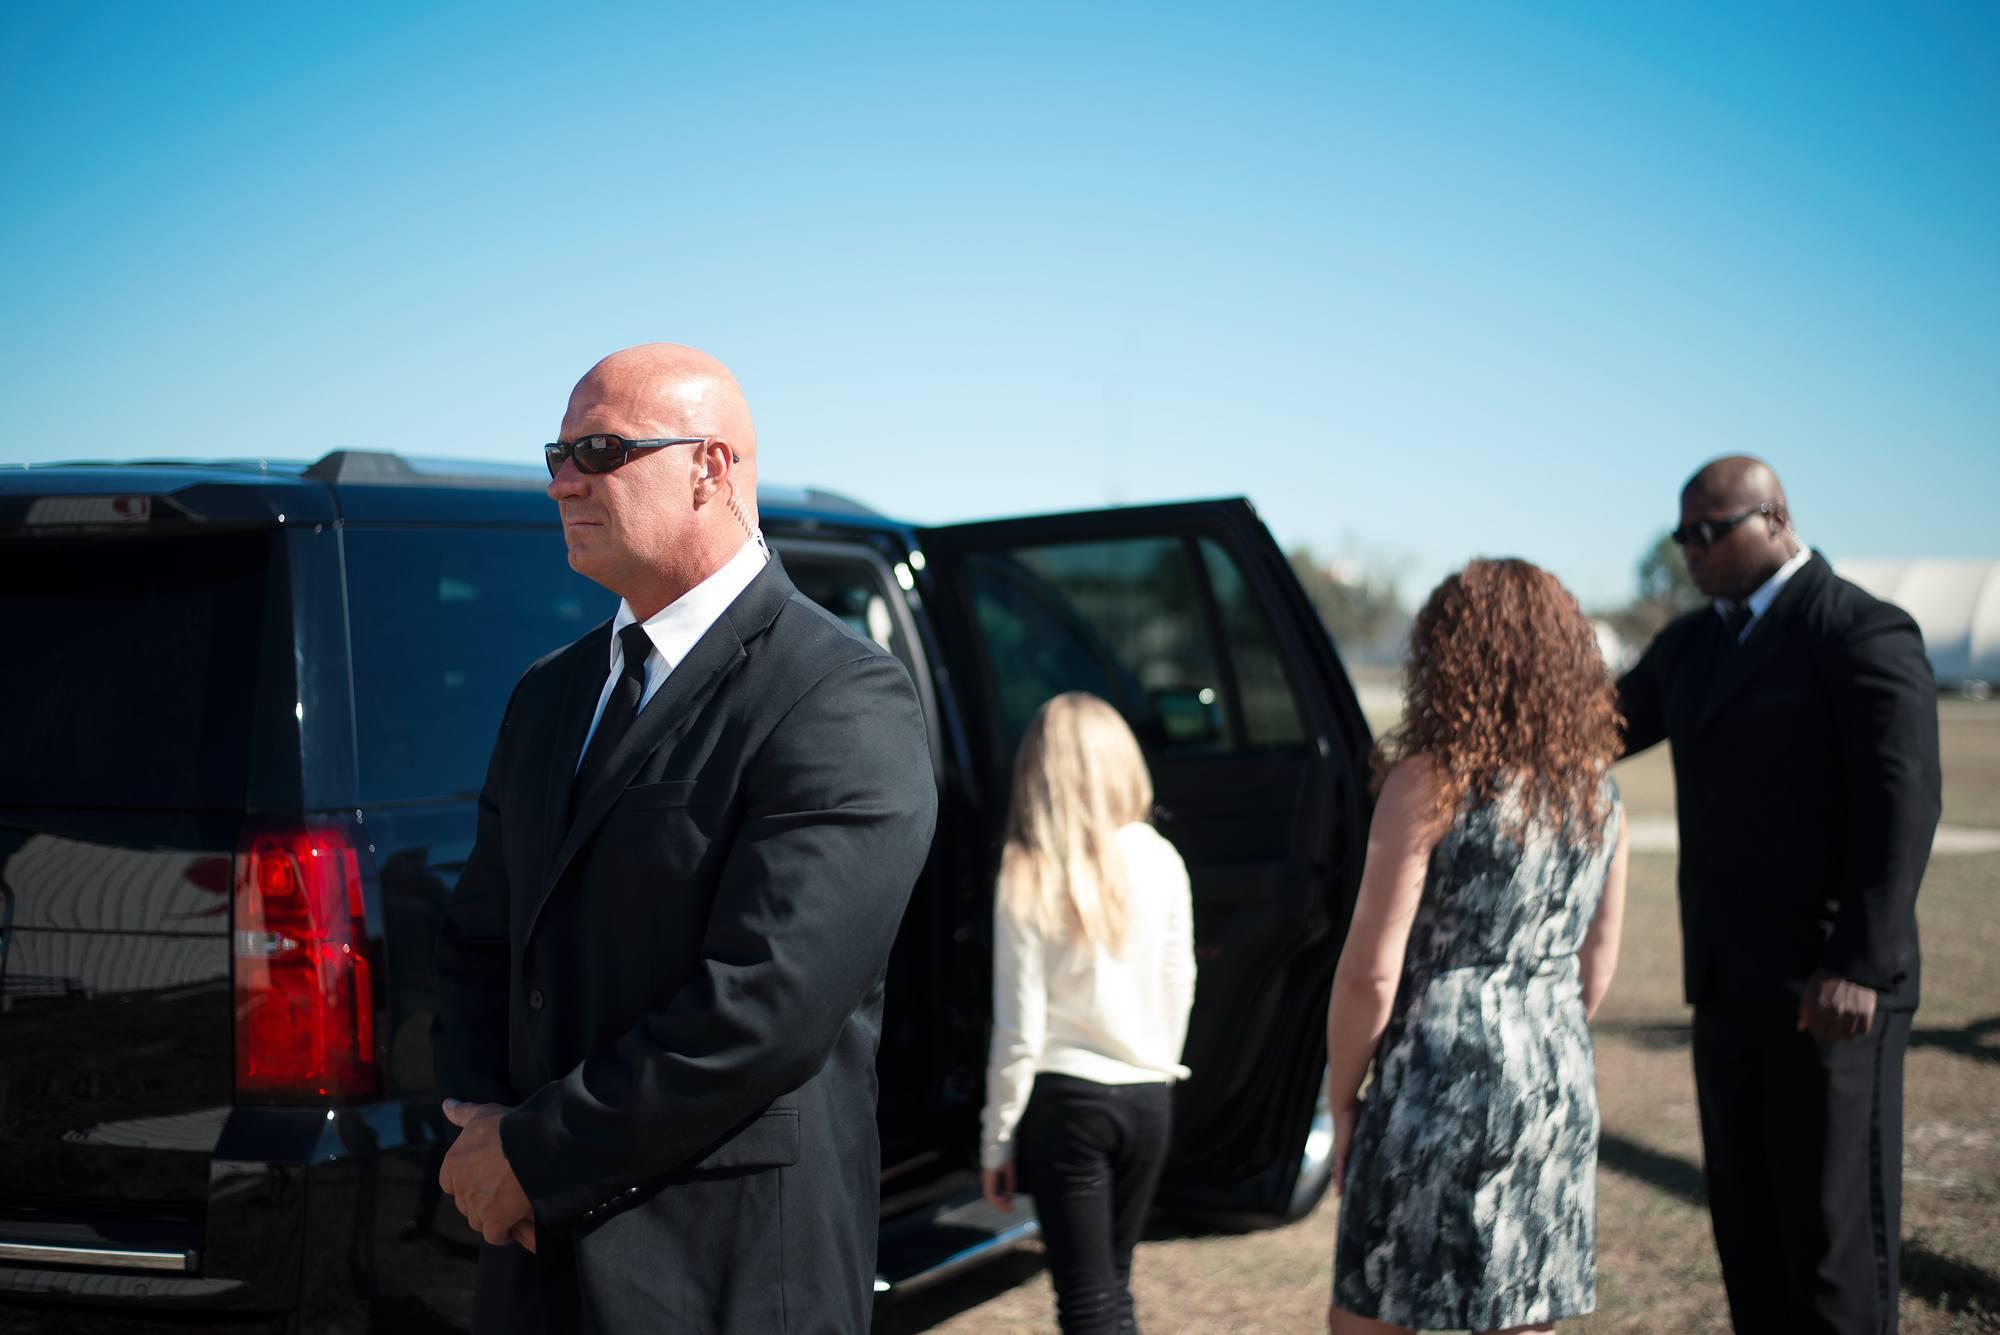 bodyguards-escorting-family